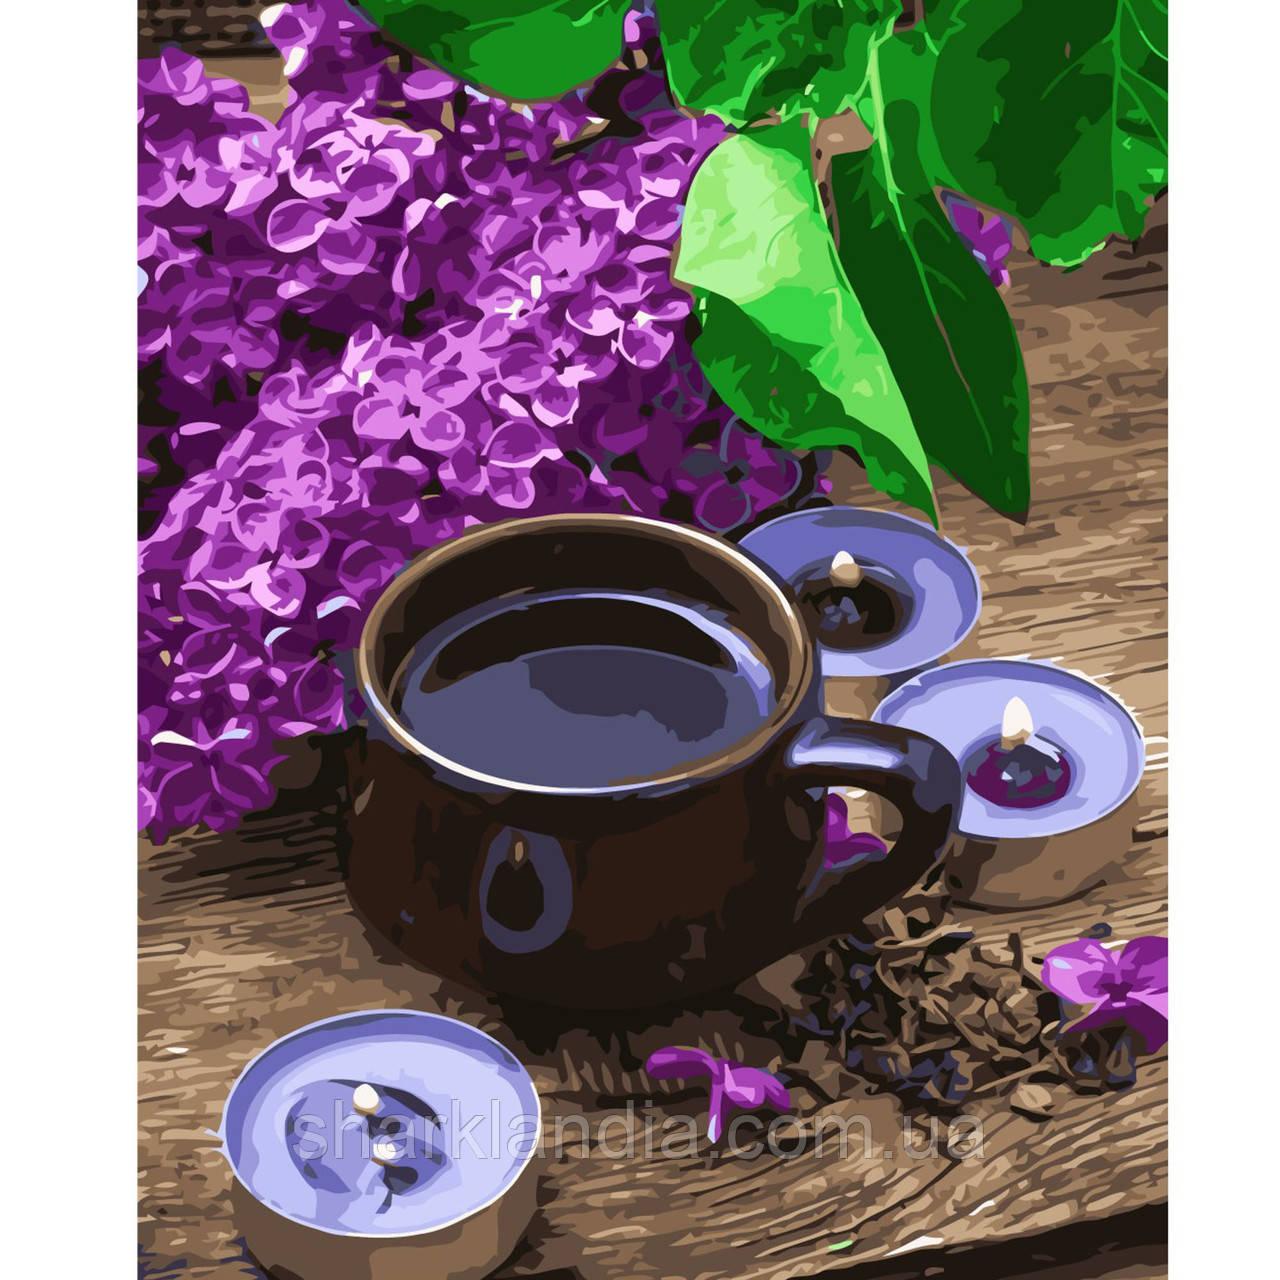 Картина по номерам Кофе с серенью 40х50см Strateg Раскраска по цифрам